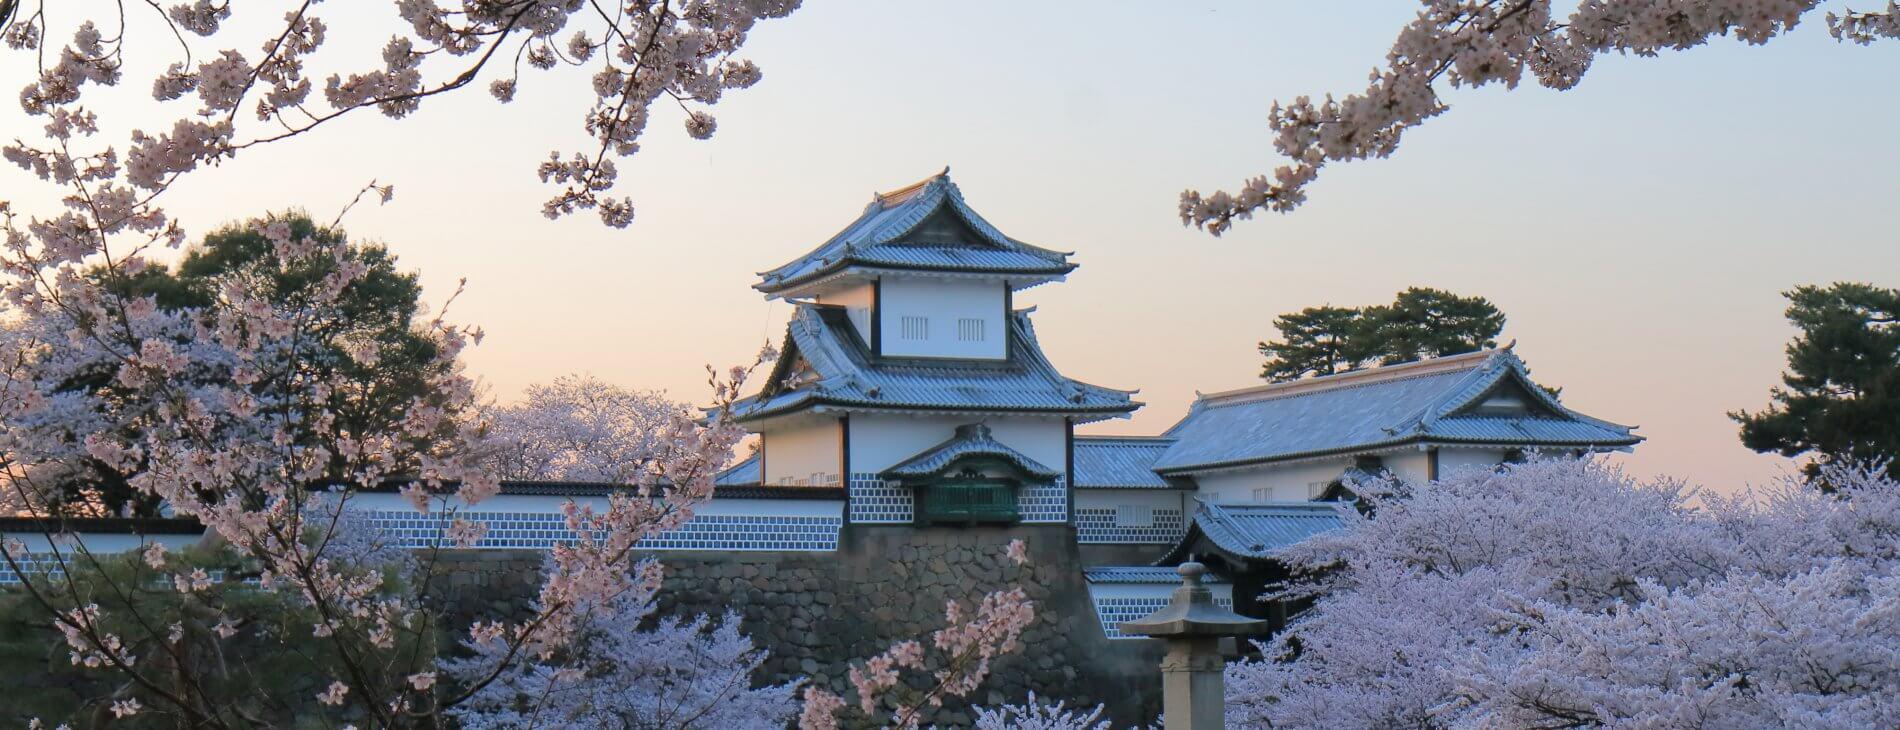 MastroKimono-Kanazawa-castle-cherry blossoms